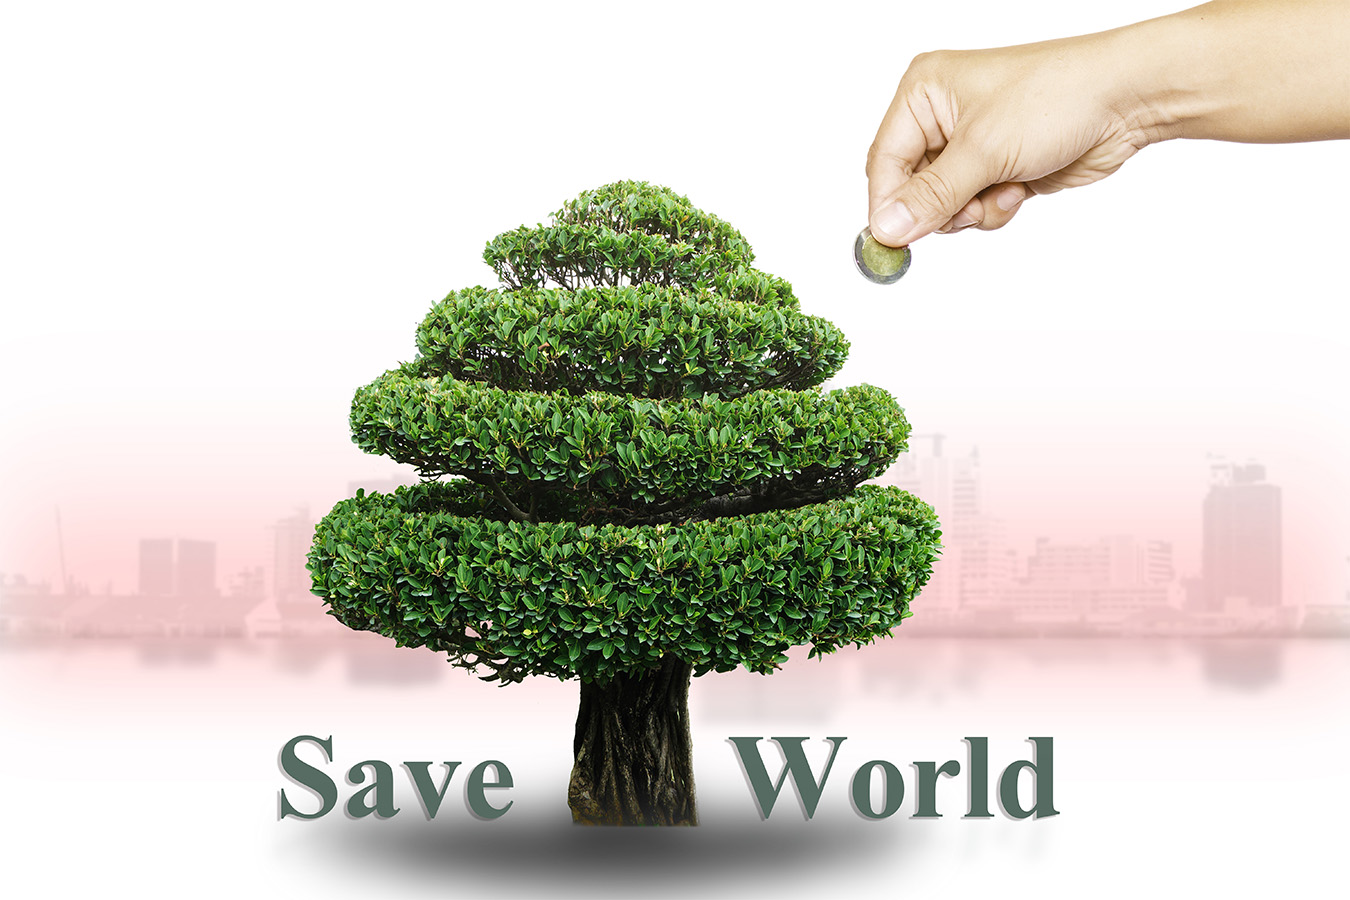 【TGA x 食力】永續農法的核心思維:高效、環保、滿足經濟需求